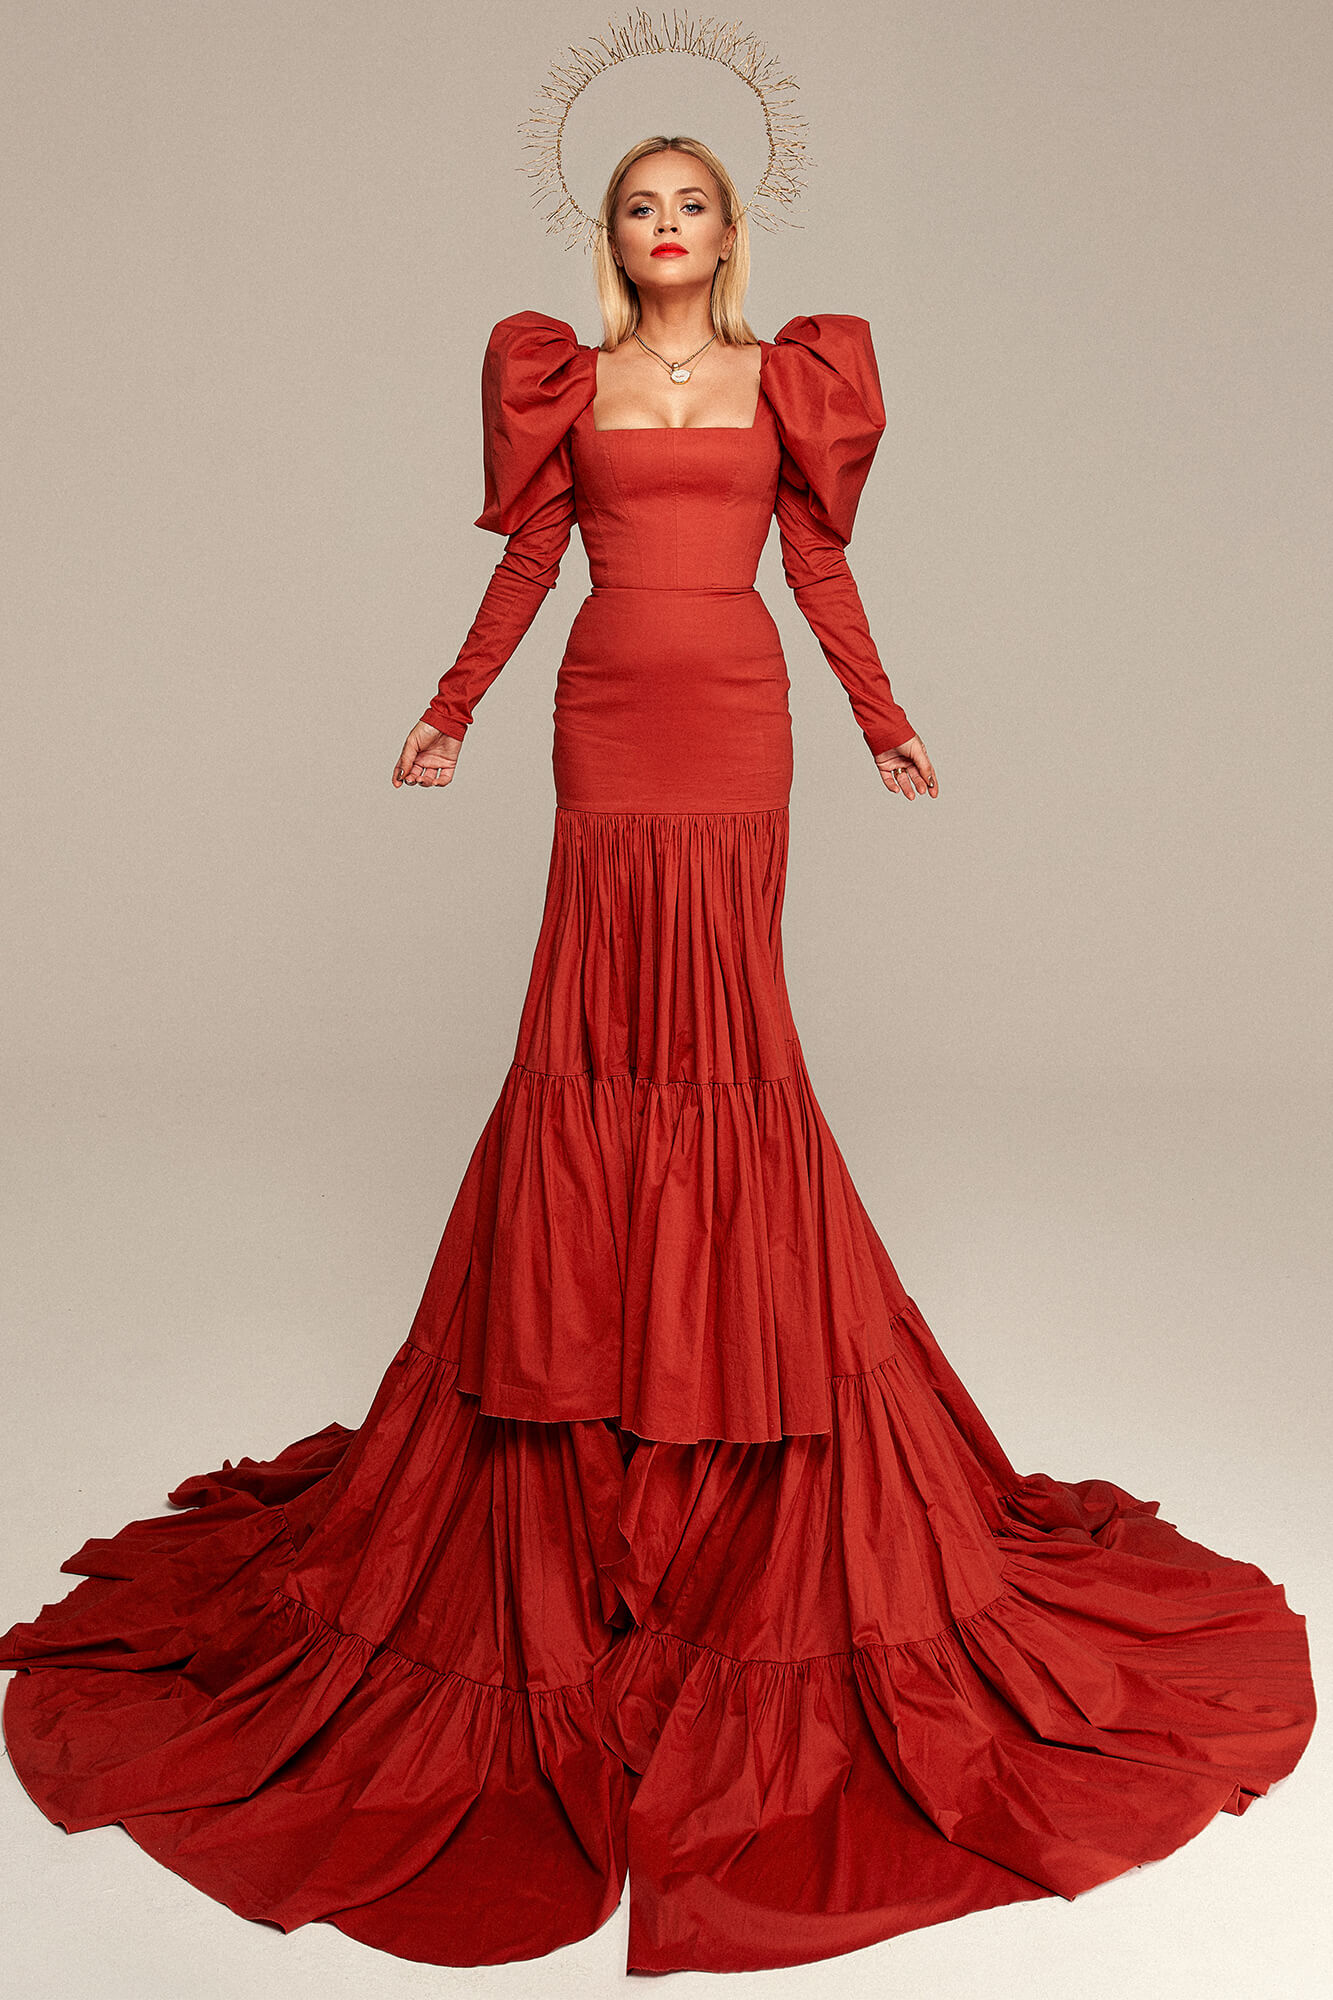 Efektowna suknia z trenem no. 2 Haute Couture collection Haute Couture 2